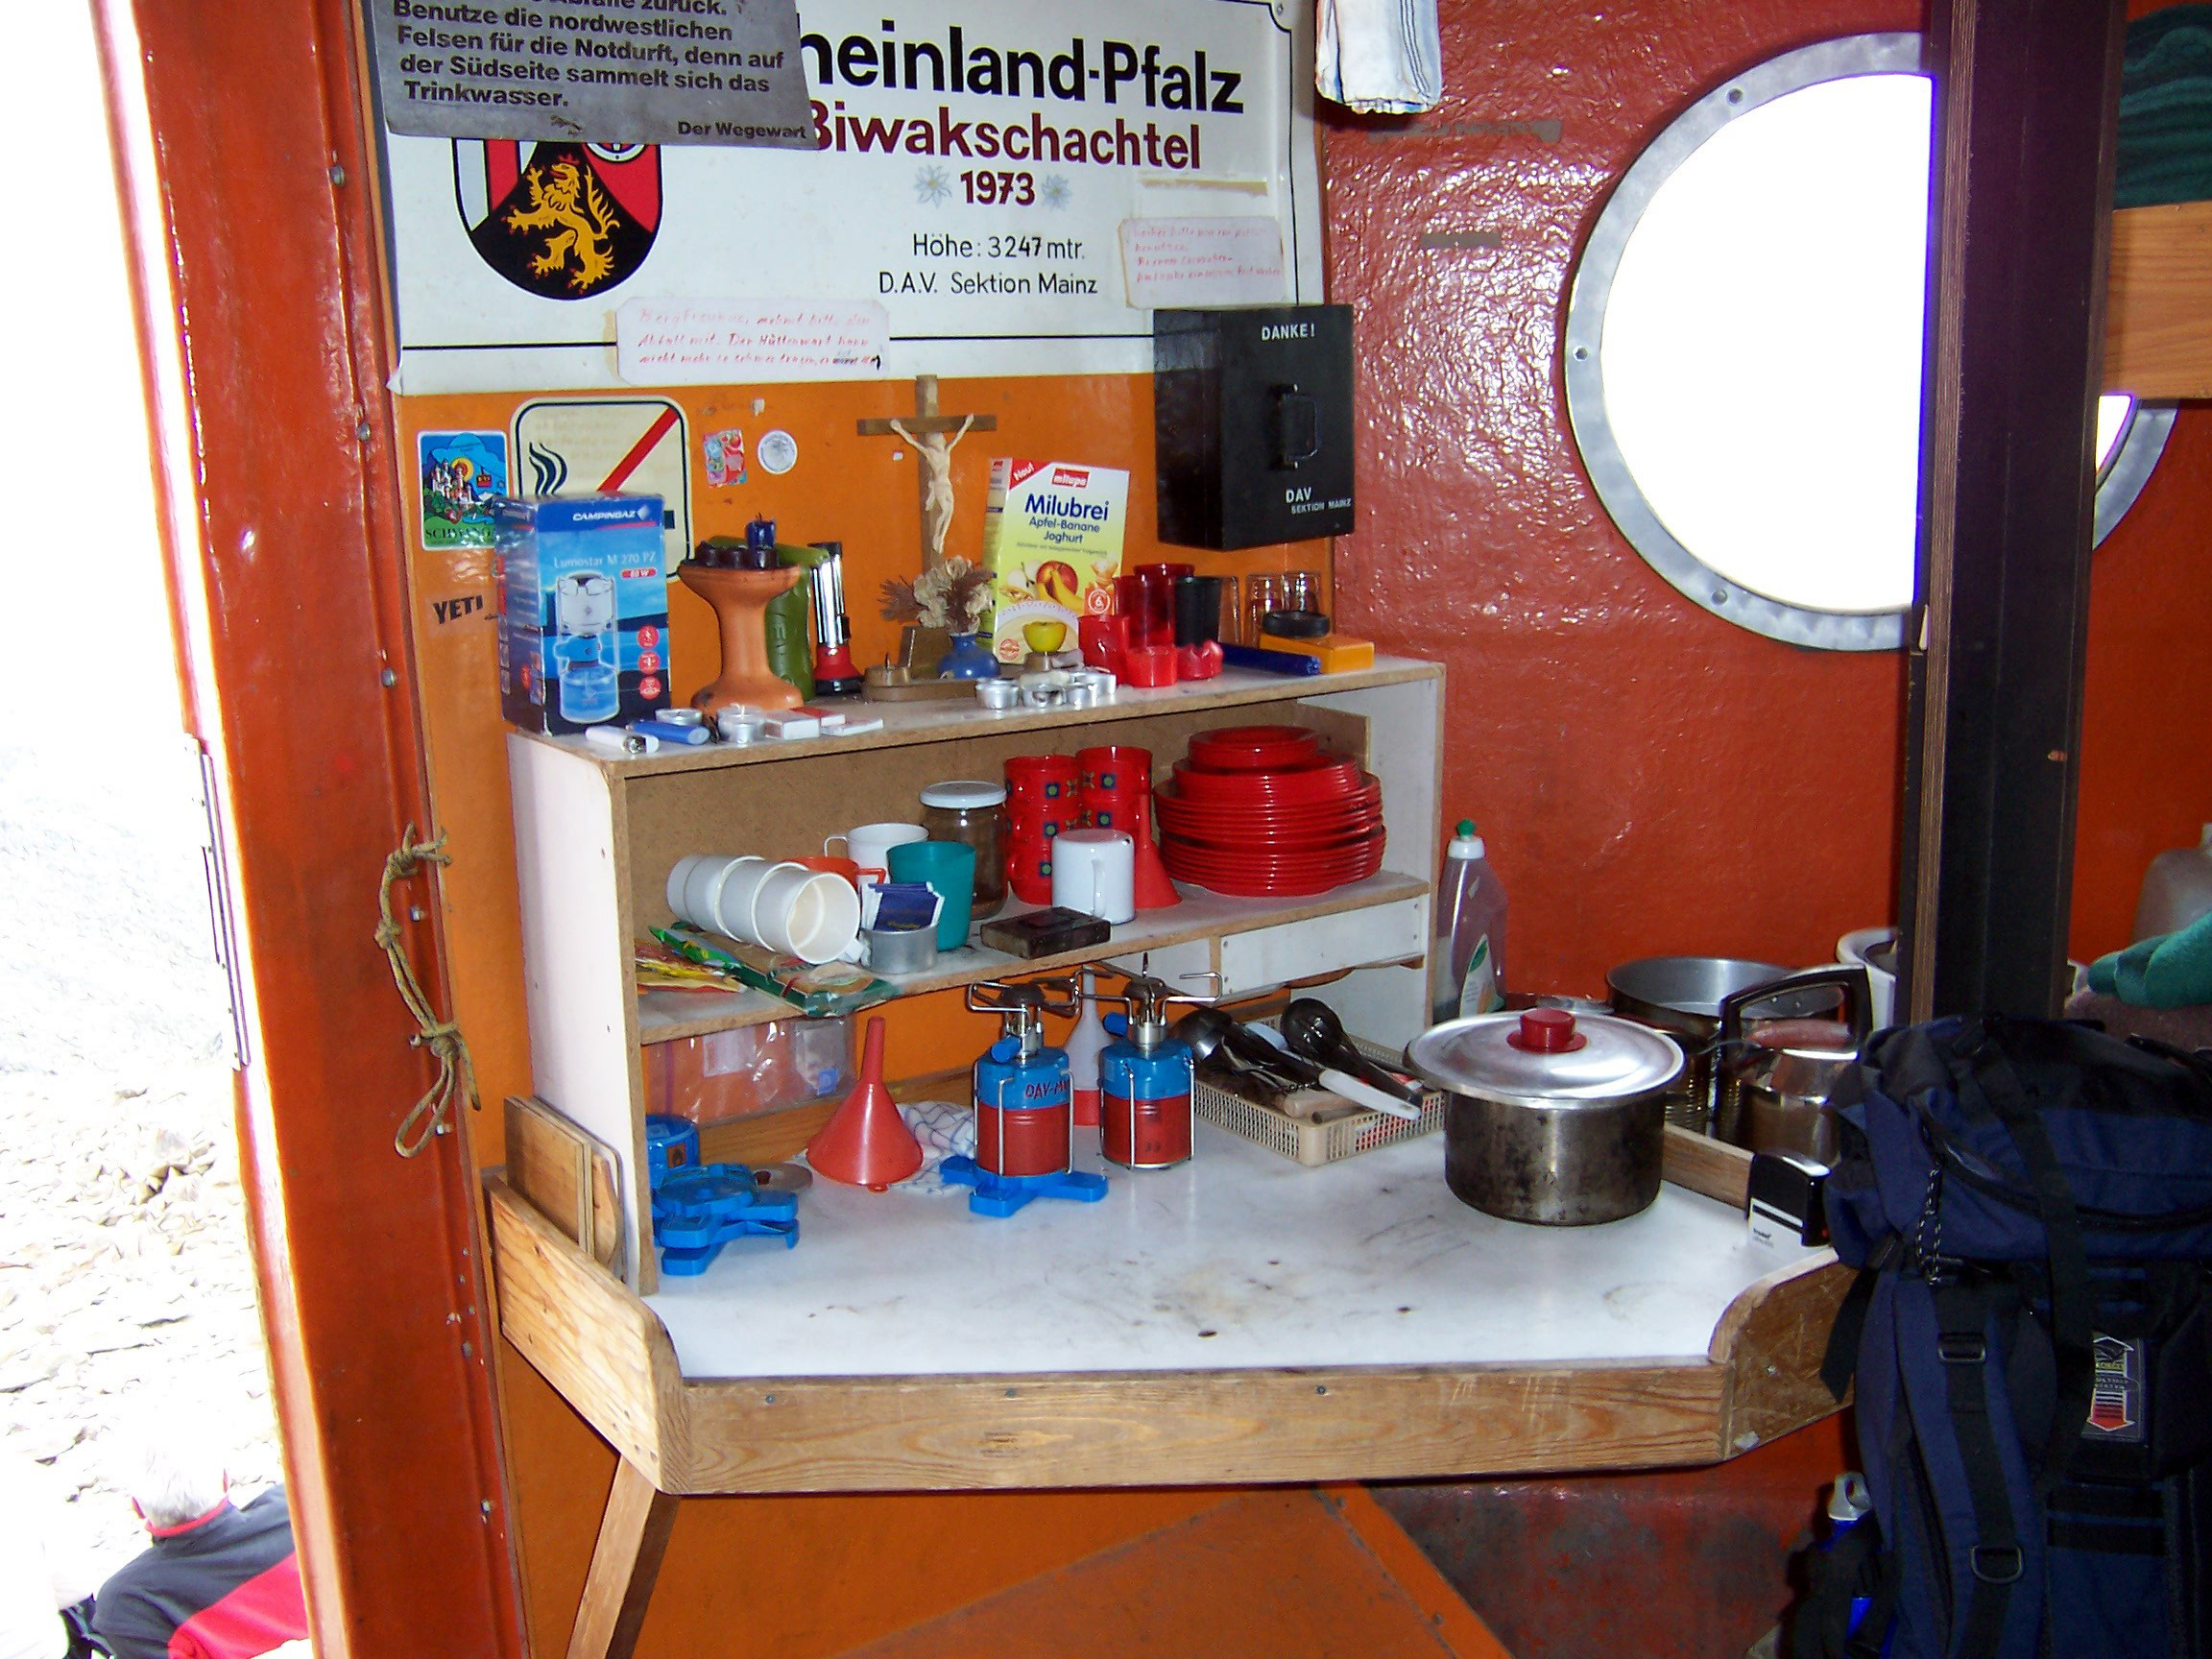 Http Www Rheinland Pfalz Blogger De Info Repair Cafe Trier Erfolg